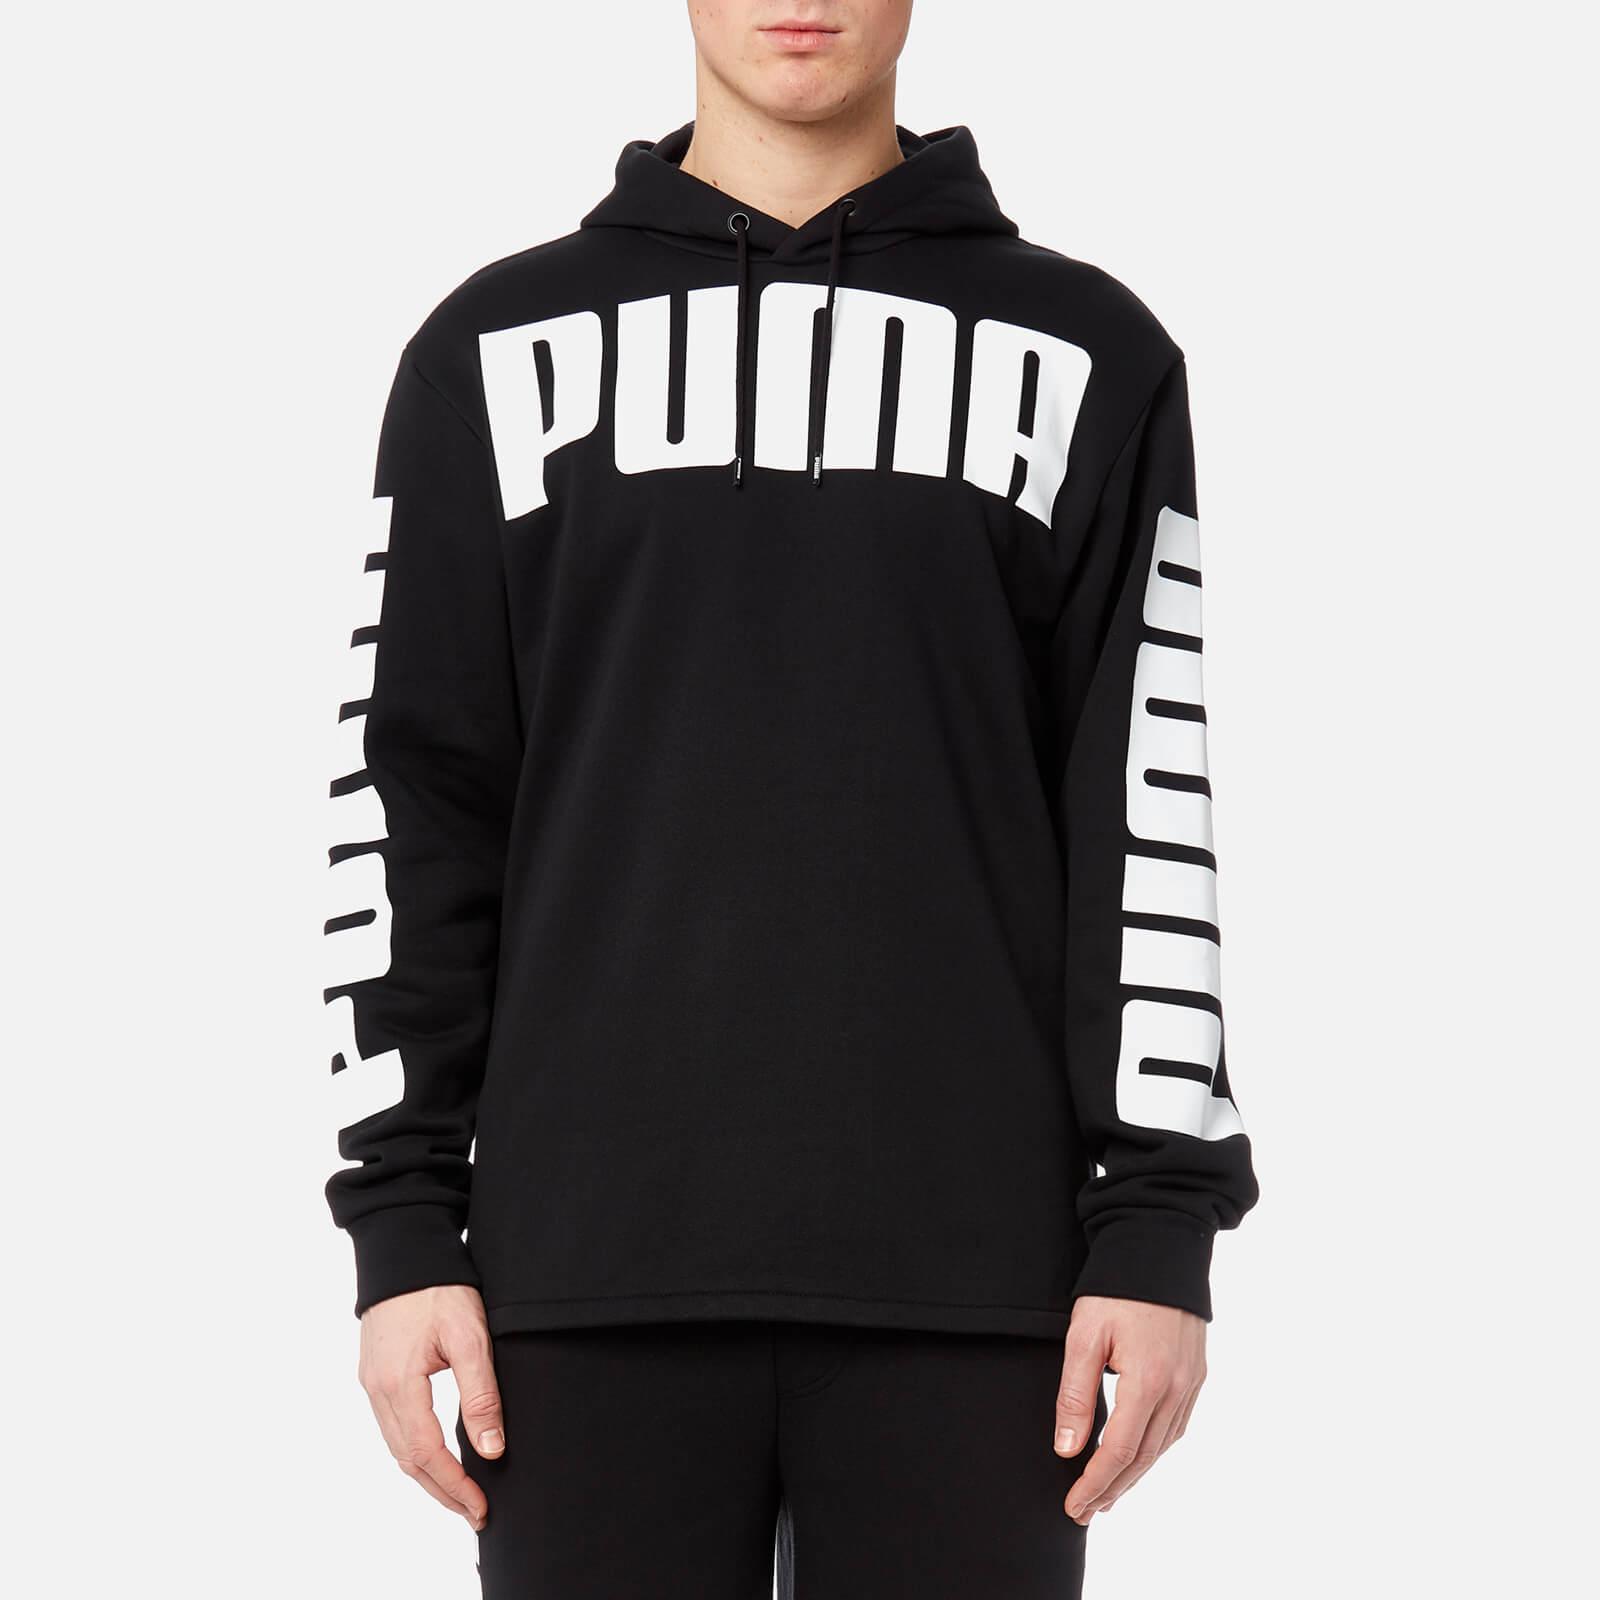 28444bf8fc837 Puma Men's Rebel Full Zip Hoody - Cotton Black